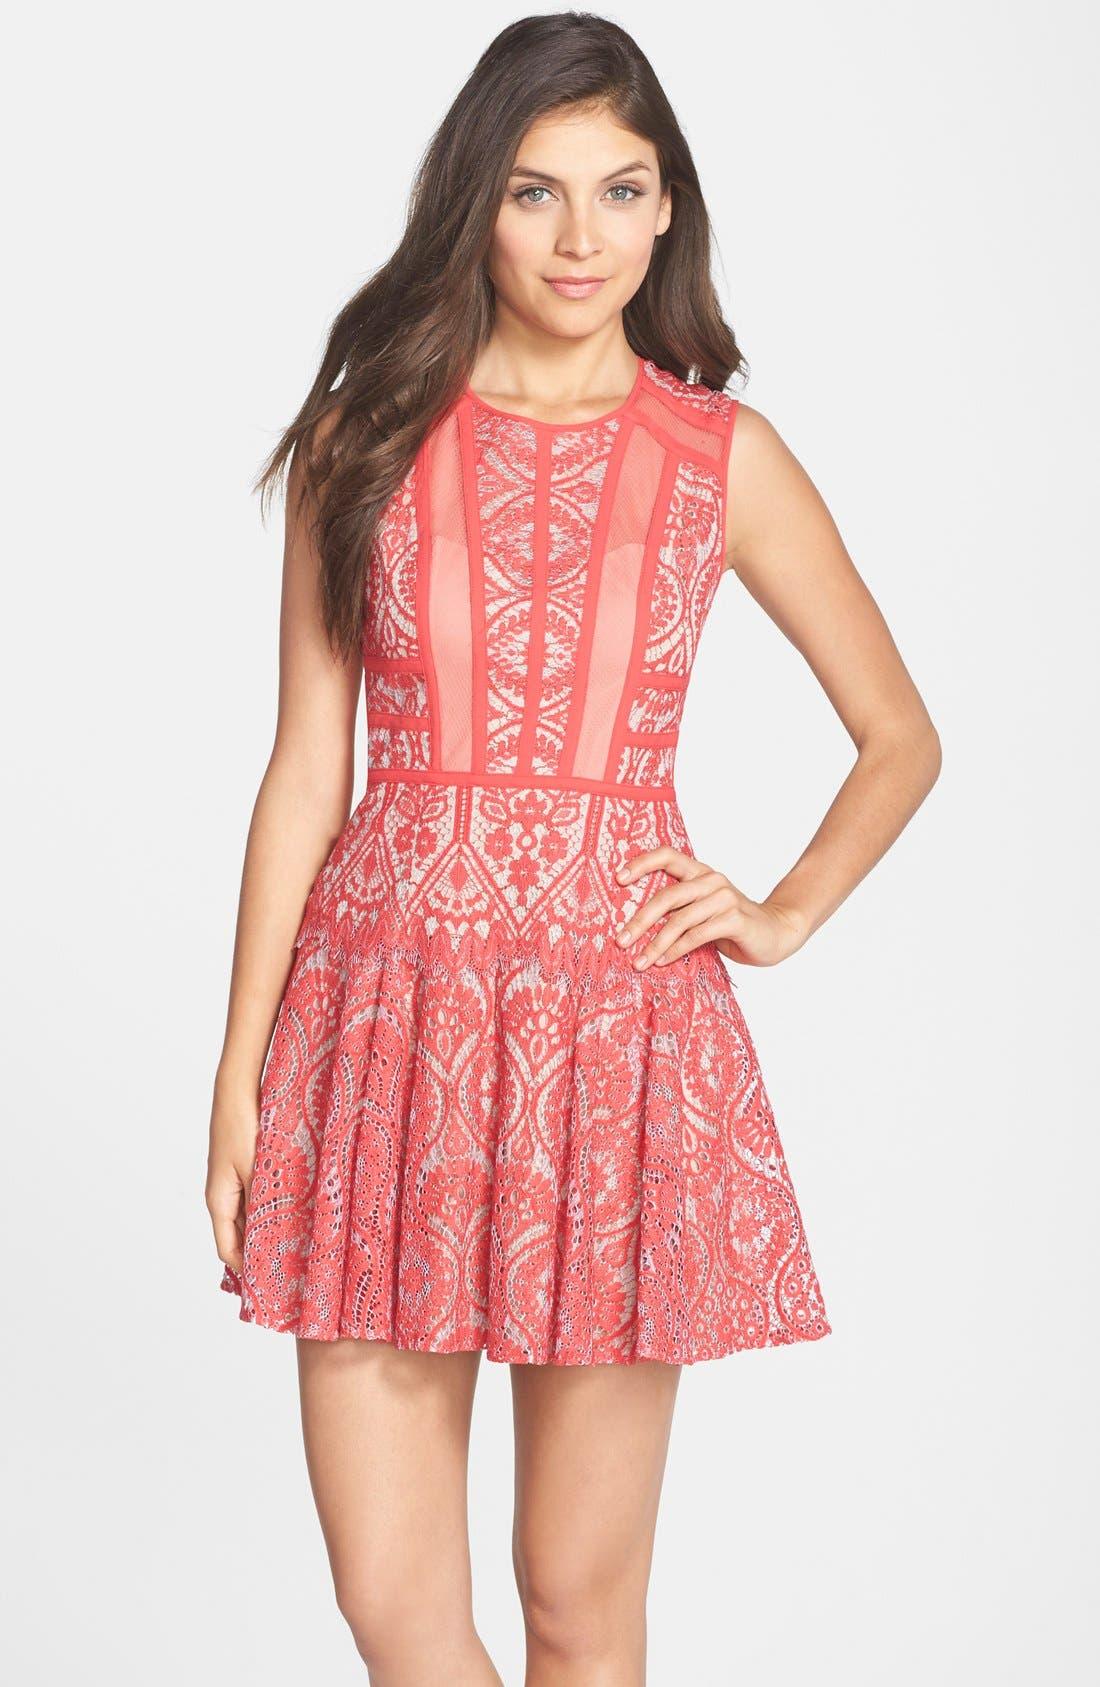 Alternate Image 1 Selected - BCBGMAXAZRIA 'Shira' Knit Lace Fit & Flare Dress